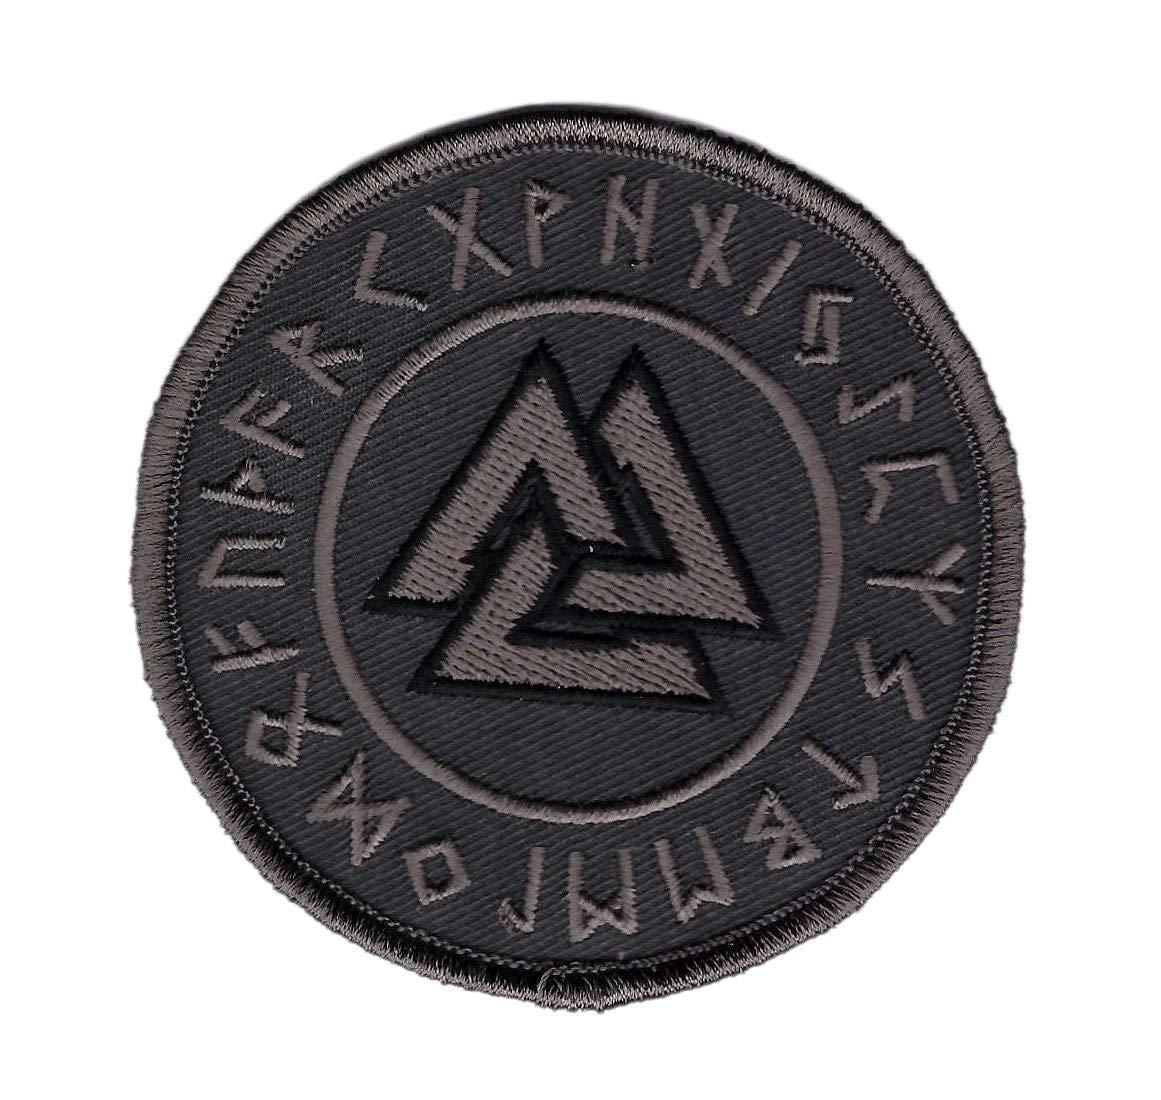 Titan One Europe Tactical Gray Viking Valknut Rune Pagan God Subdued ACU Patch Emblem Le Valknut Vikings D/écoratif Tactique /Écusson Brod/é